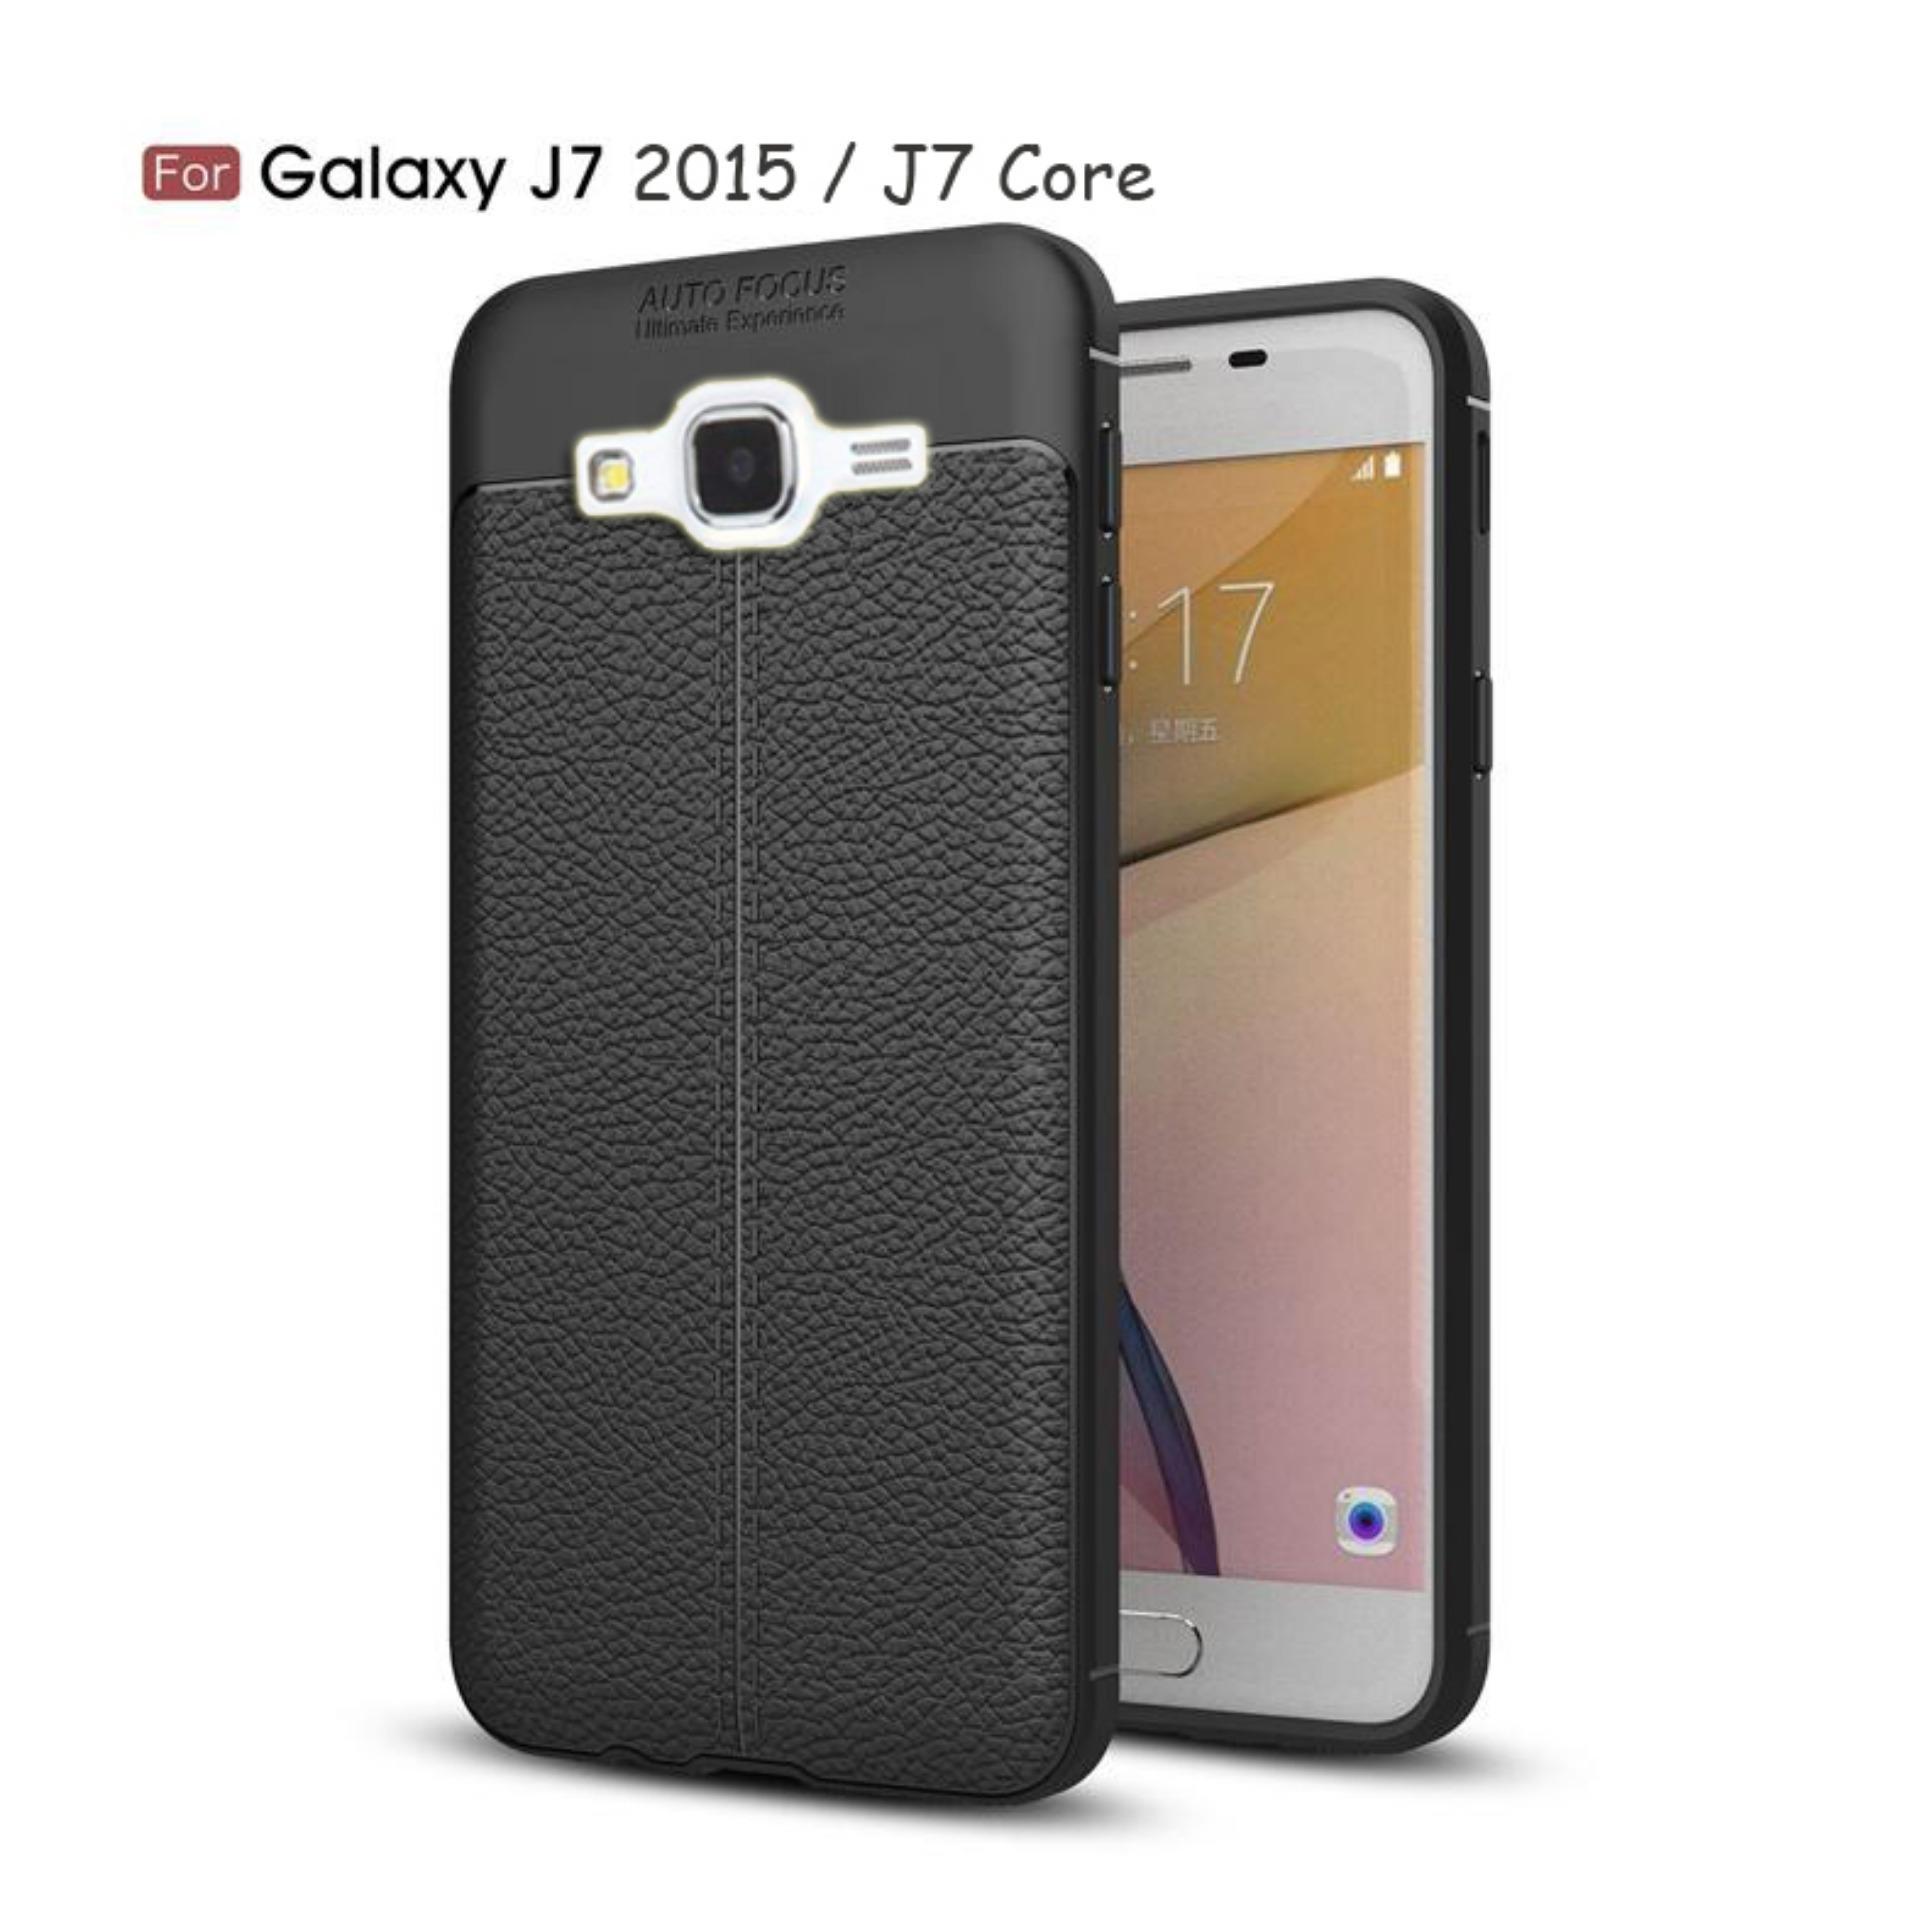 Rp 8.500. RF Lapak Case - Softcase / Casing Hp Autofocus / Silikon Motif Kulit Leather Auto Focus Samsung Galaxy ...